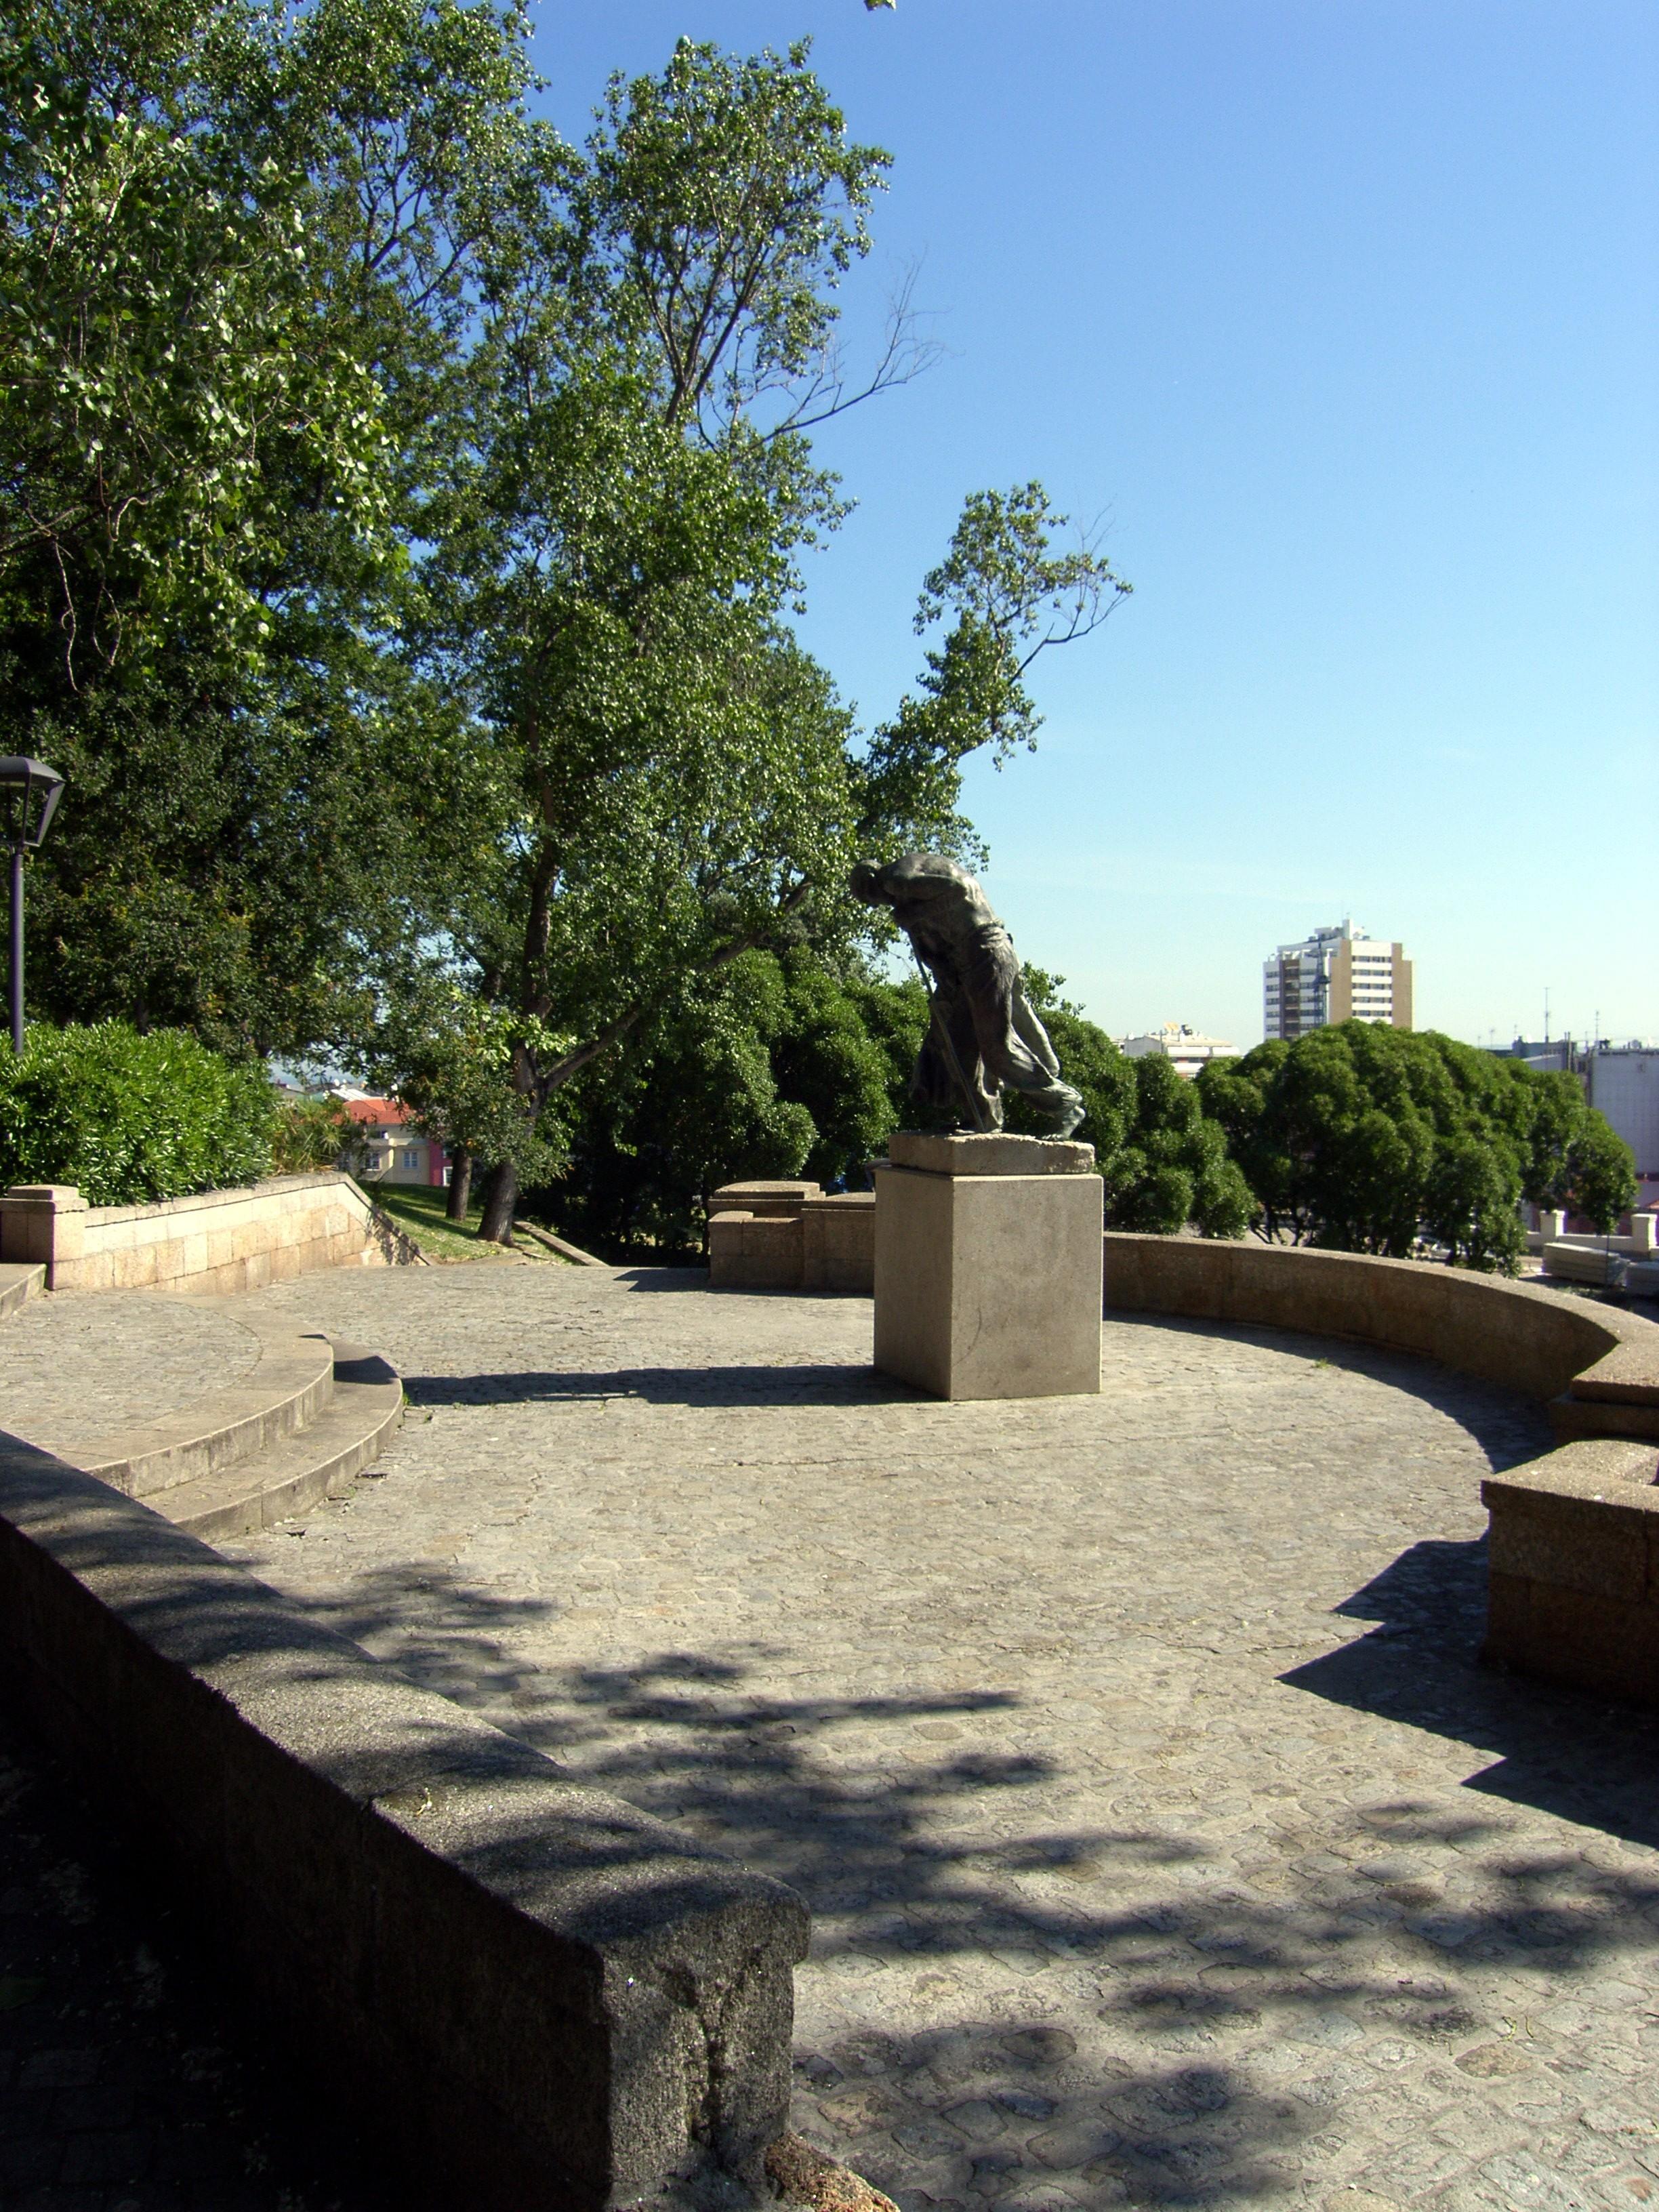 Landschaft Baum Zuhause Gehweg Hinterhof Garten Denkmal La Hof Stadtplatz  Immobilien Garten Ggl1 Coru Agaliciaspainscenery